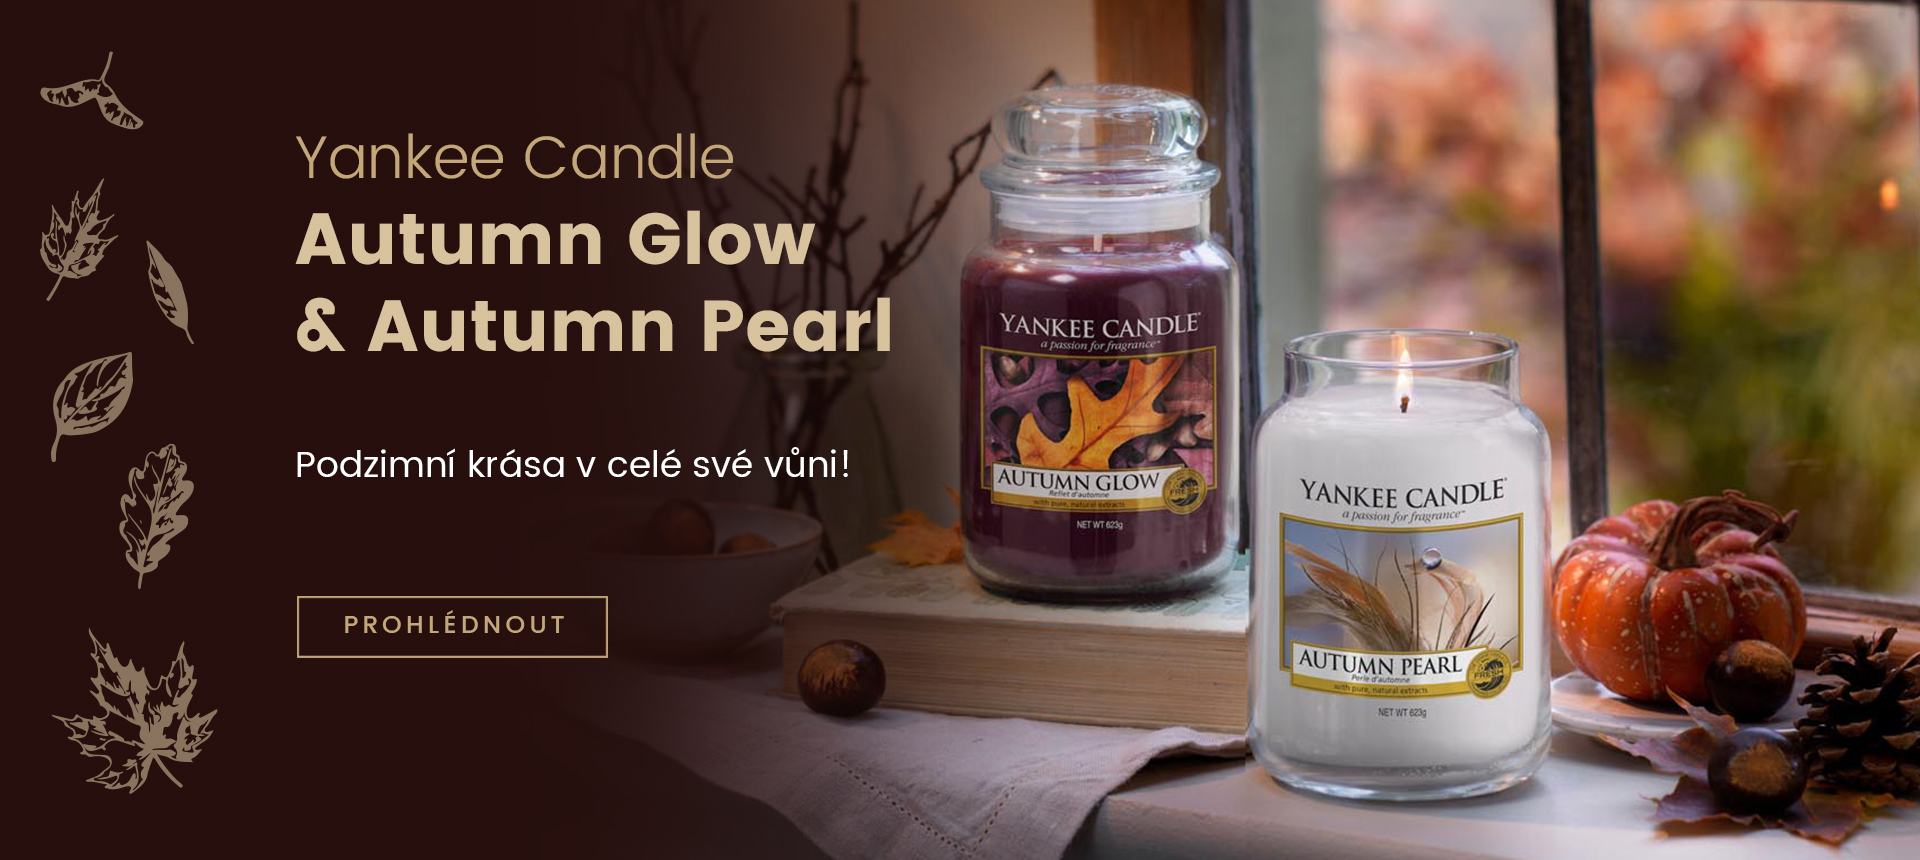 Yankee Candle Autumn Glow